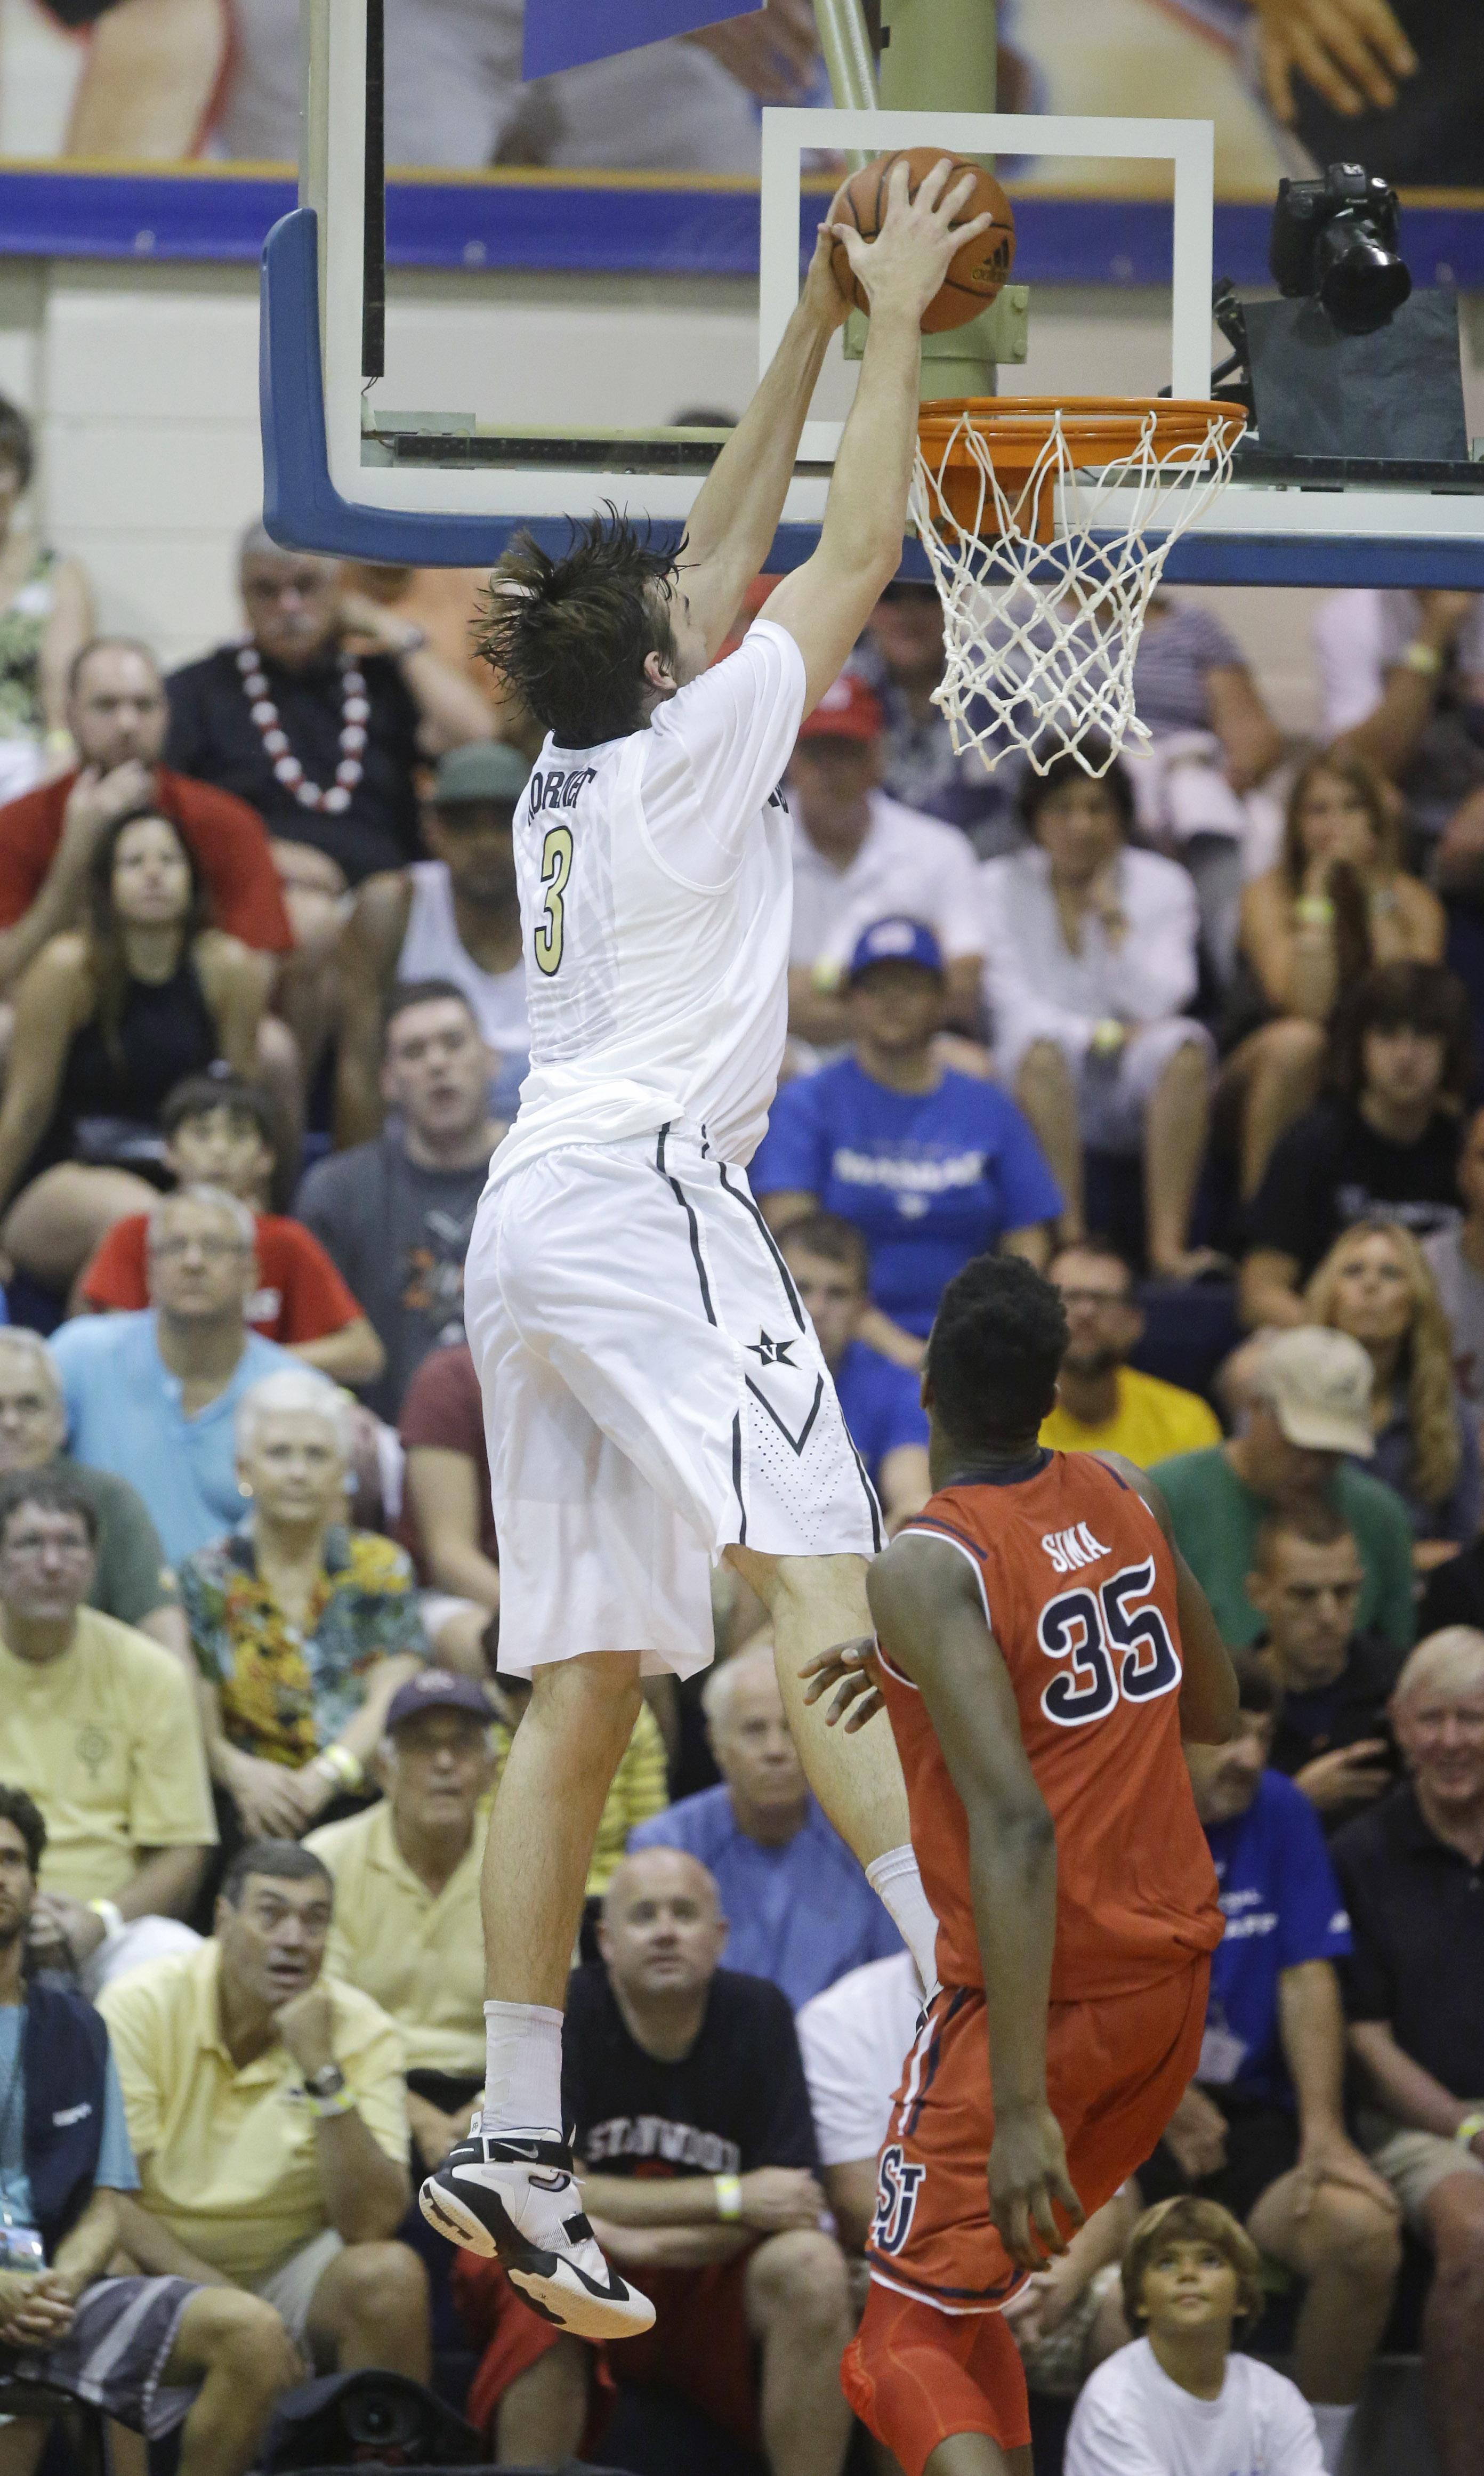 Vanderbilt forward Luke Kornet (3) dunks the ball against St. John's center Yankuba Sima (35) in the first half during an NCAA college basketball game in the first round of the Maui Invitational Monday, Nov. 23, 2015, in Lahaina, Hawaii. (AP Photo/Rick Bo